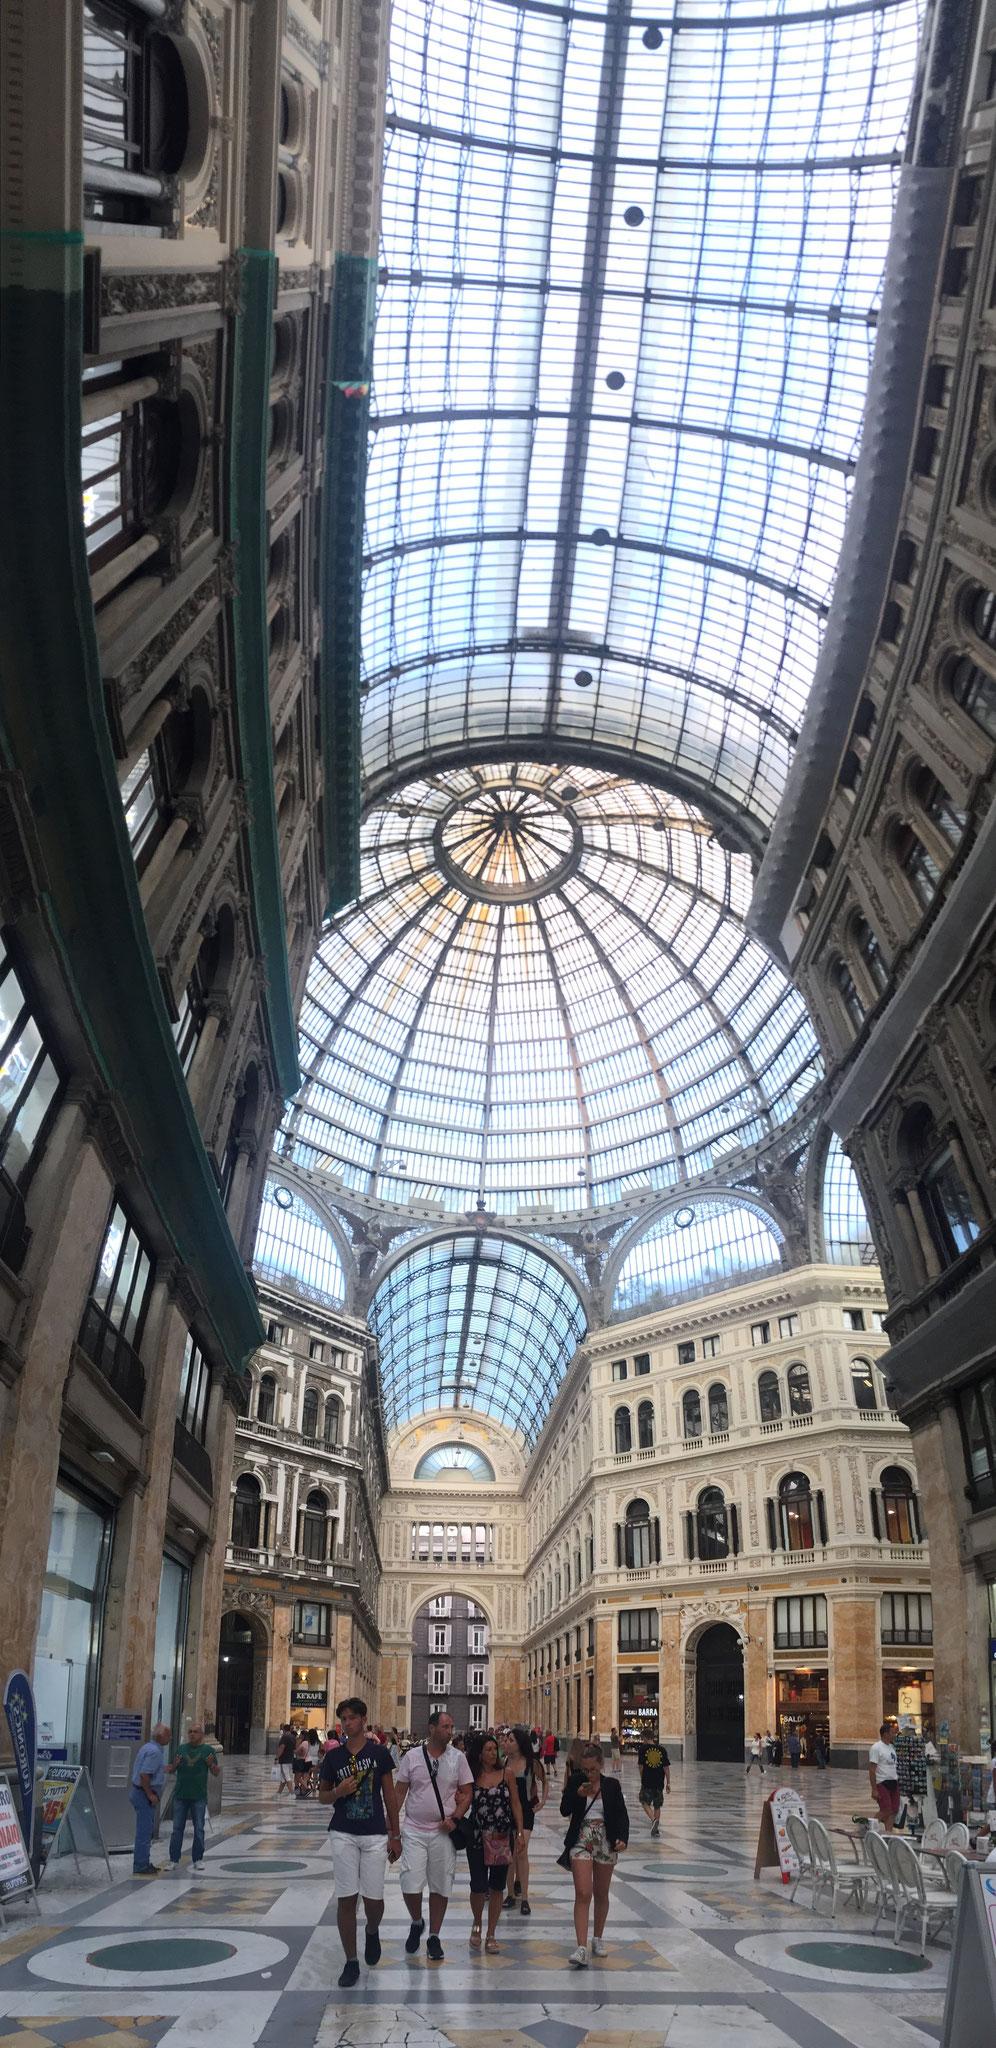 Napoli, Galleria Umberto I°